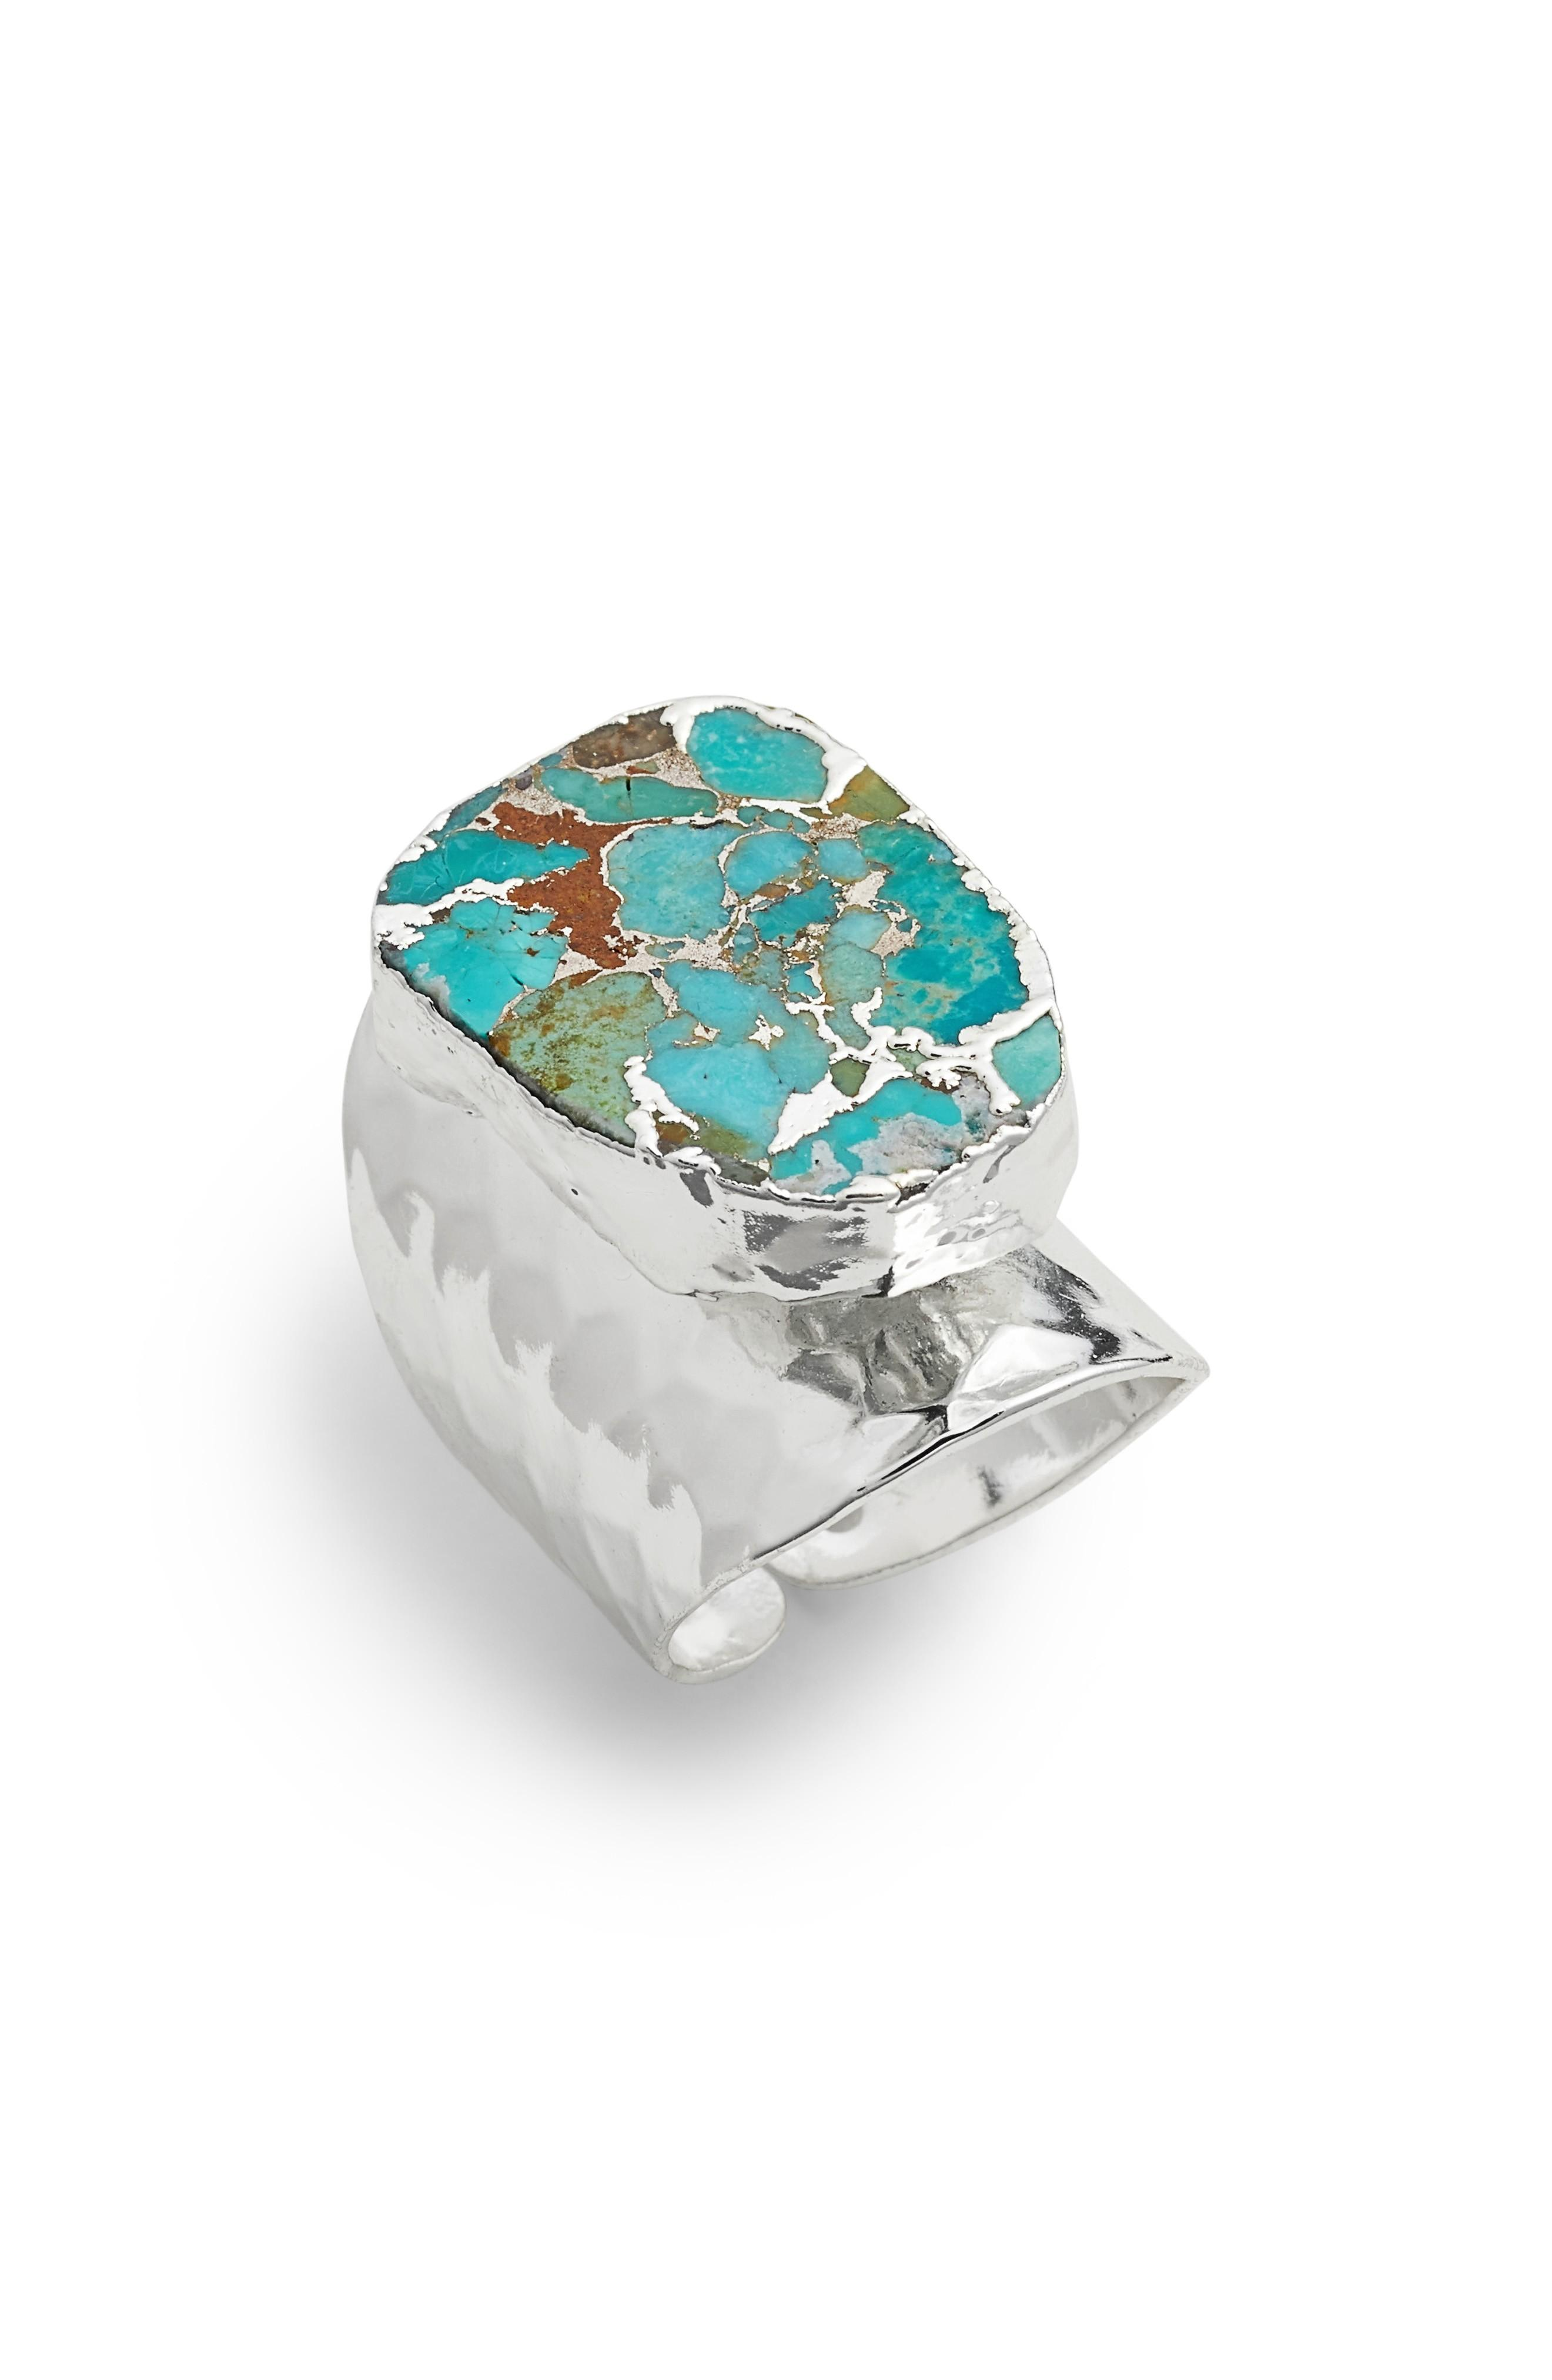 Elise M. Bonitas Hammered Cuff Ring In Silver